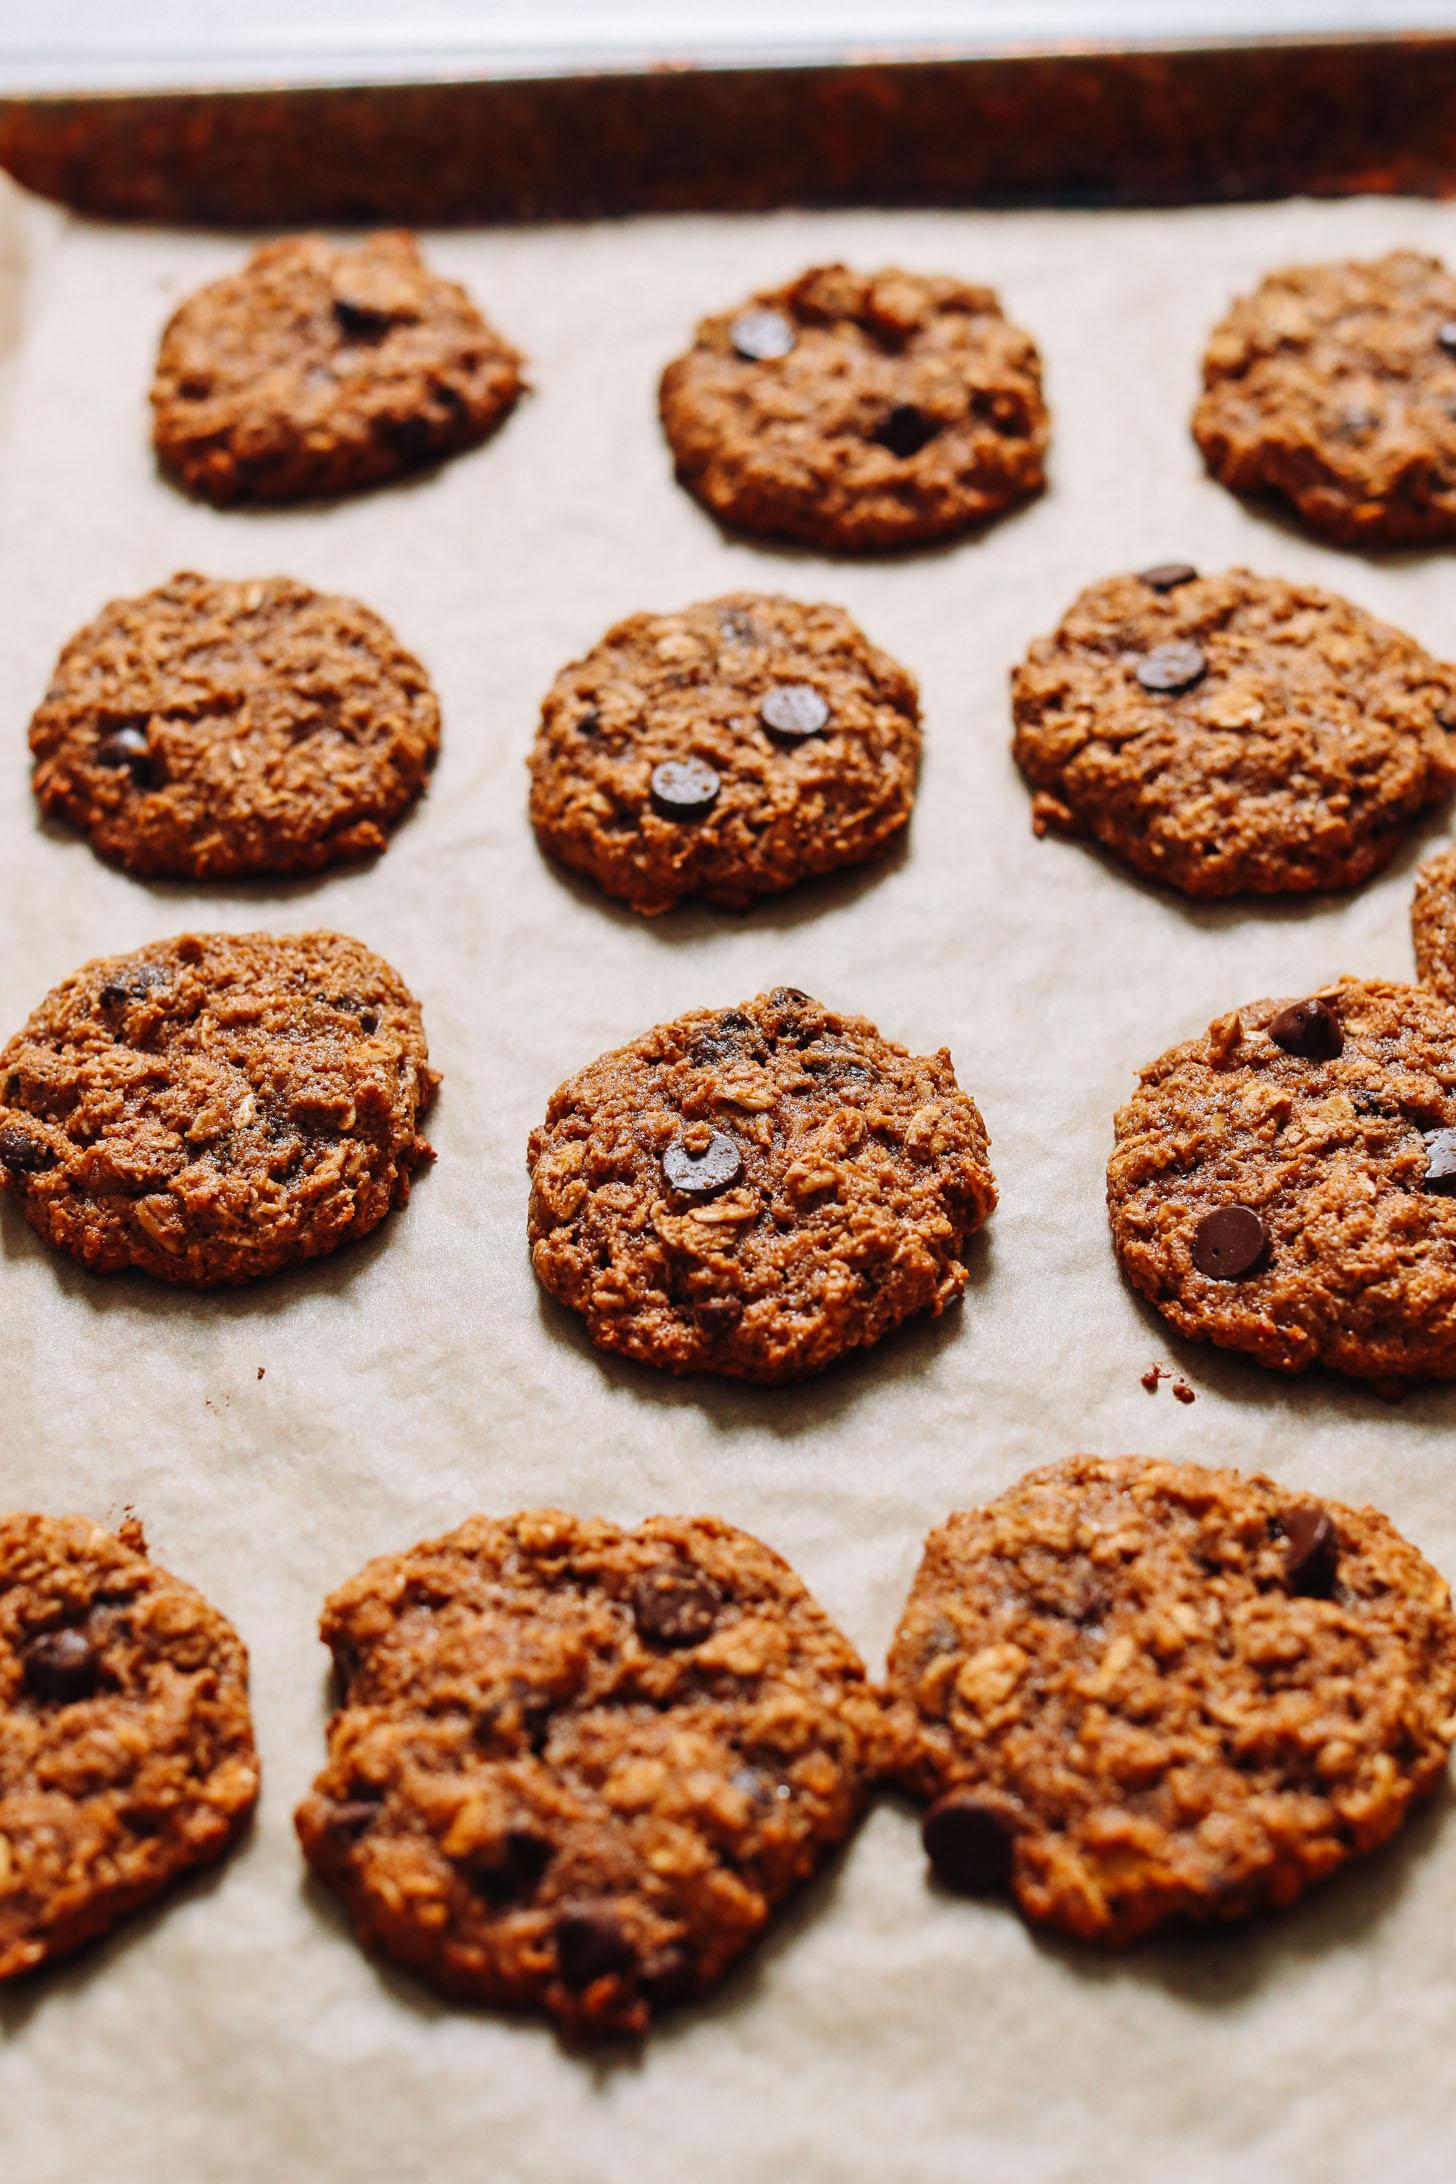 Baking sheet of freshly baked Pumpkin Chocolate Chip Cookies